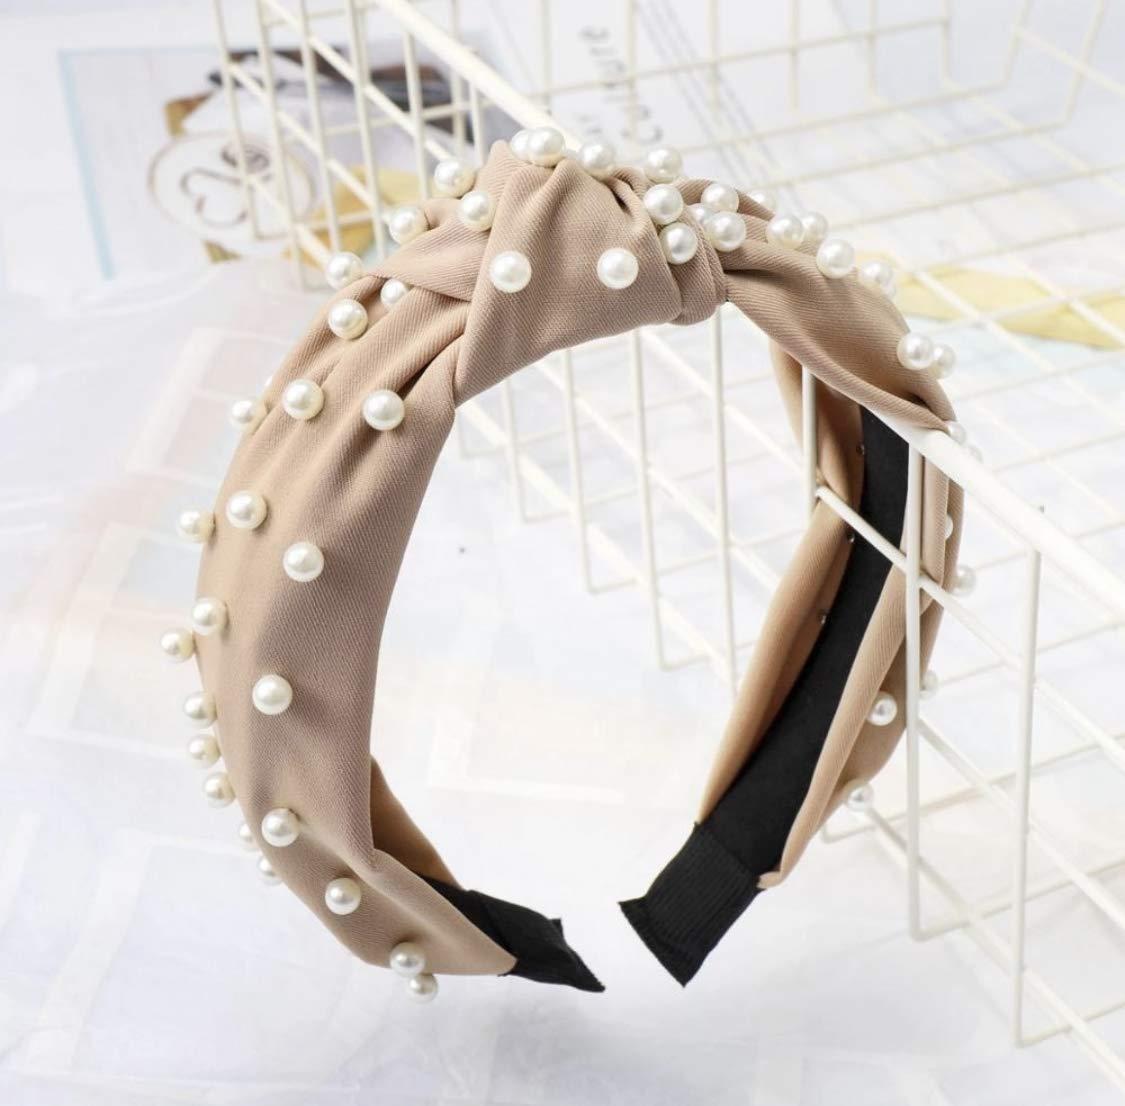 Satin Top-knot Pearl Embellished Headband (Satin Beige)